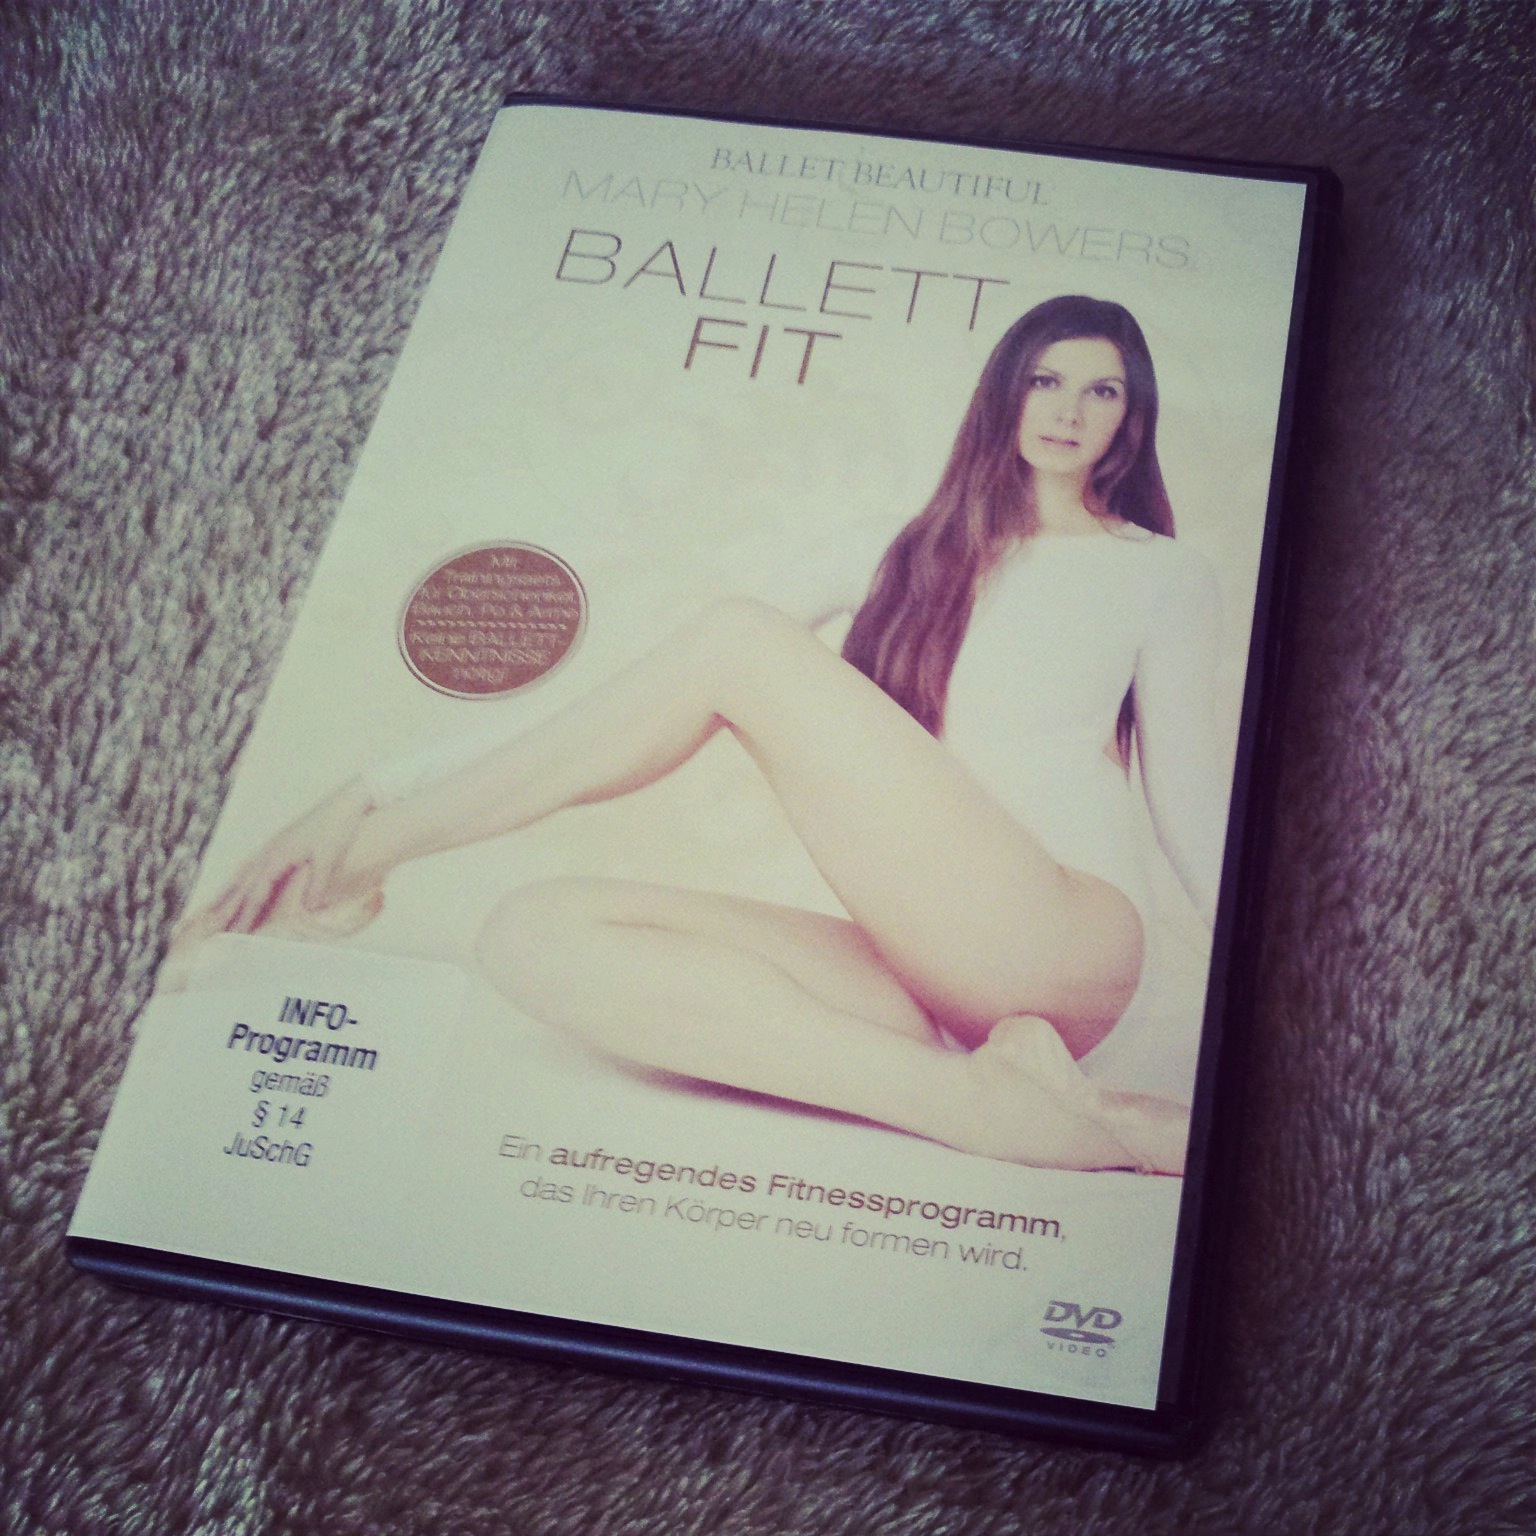 Ballett Fit